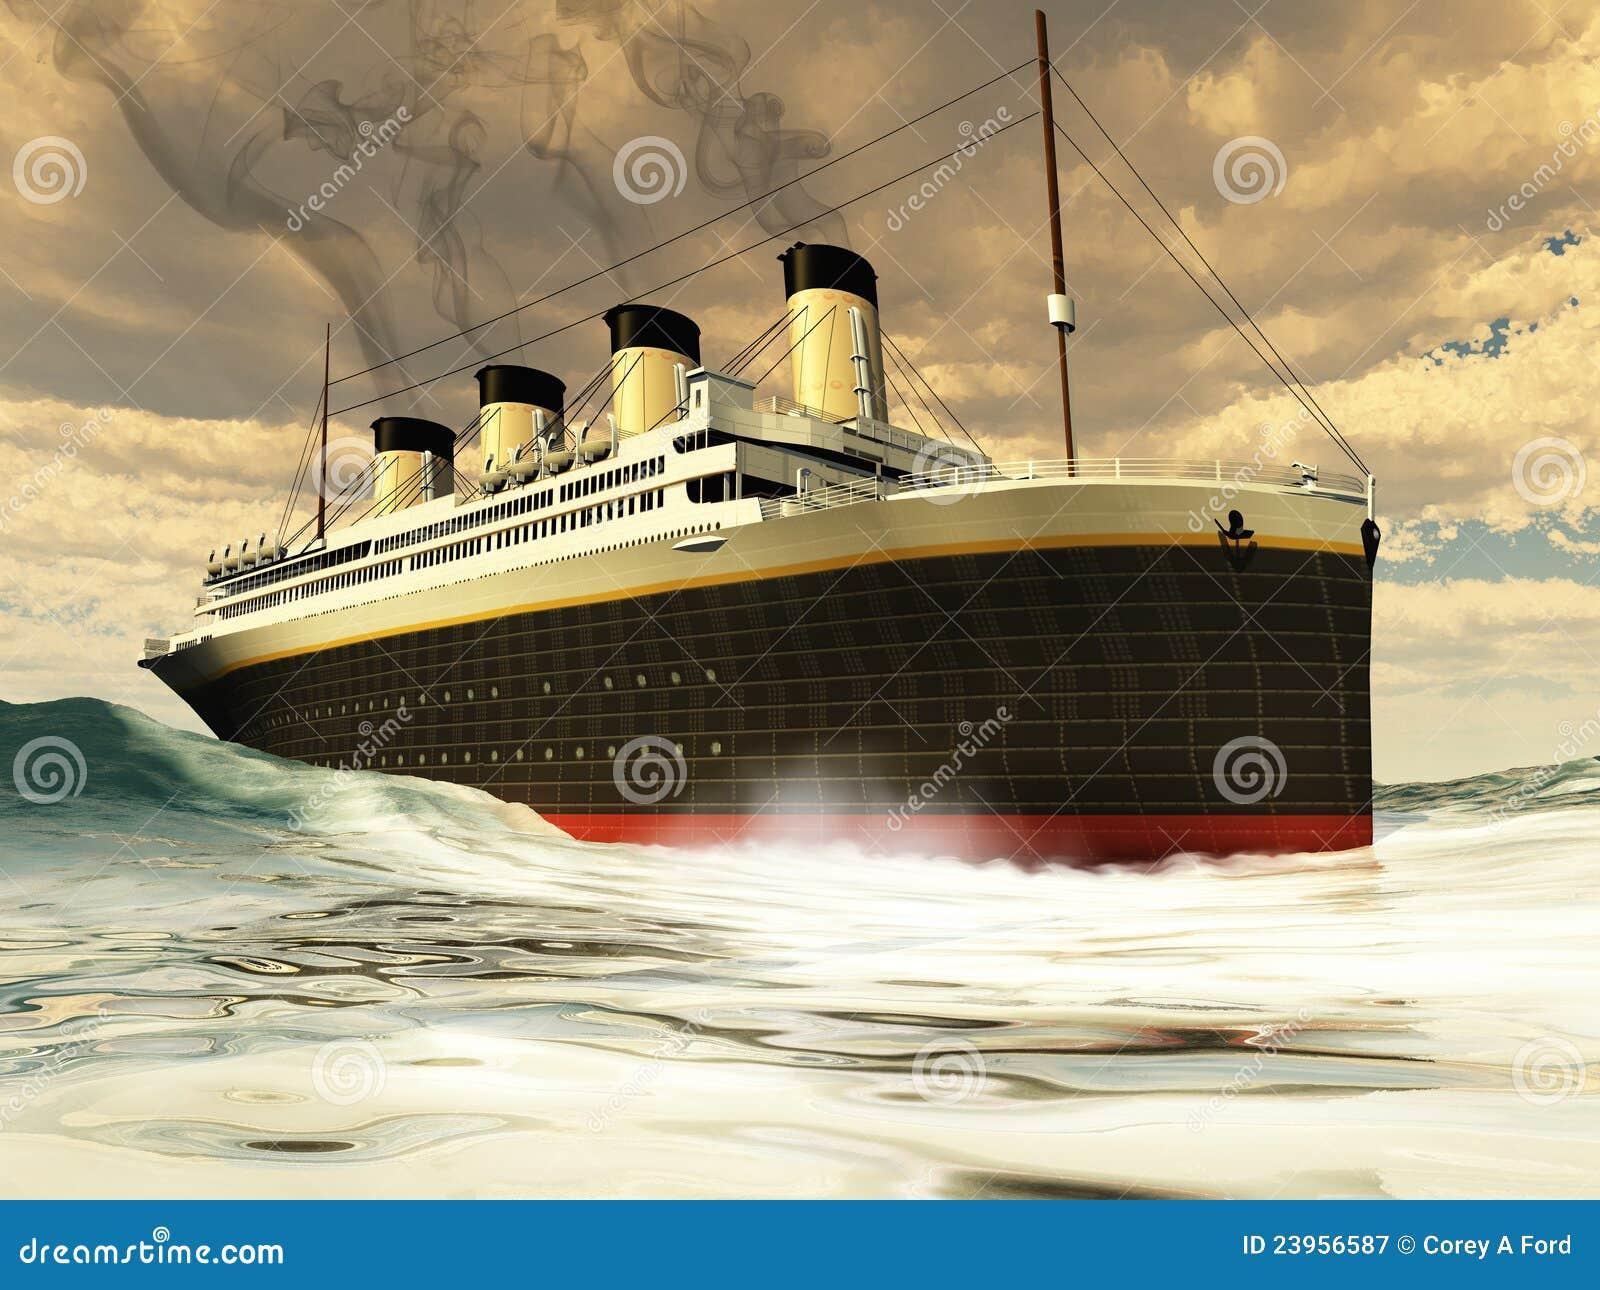 Titanic Ship Royalty Free Stock Photography Image 23956587